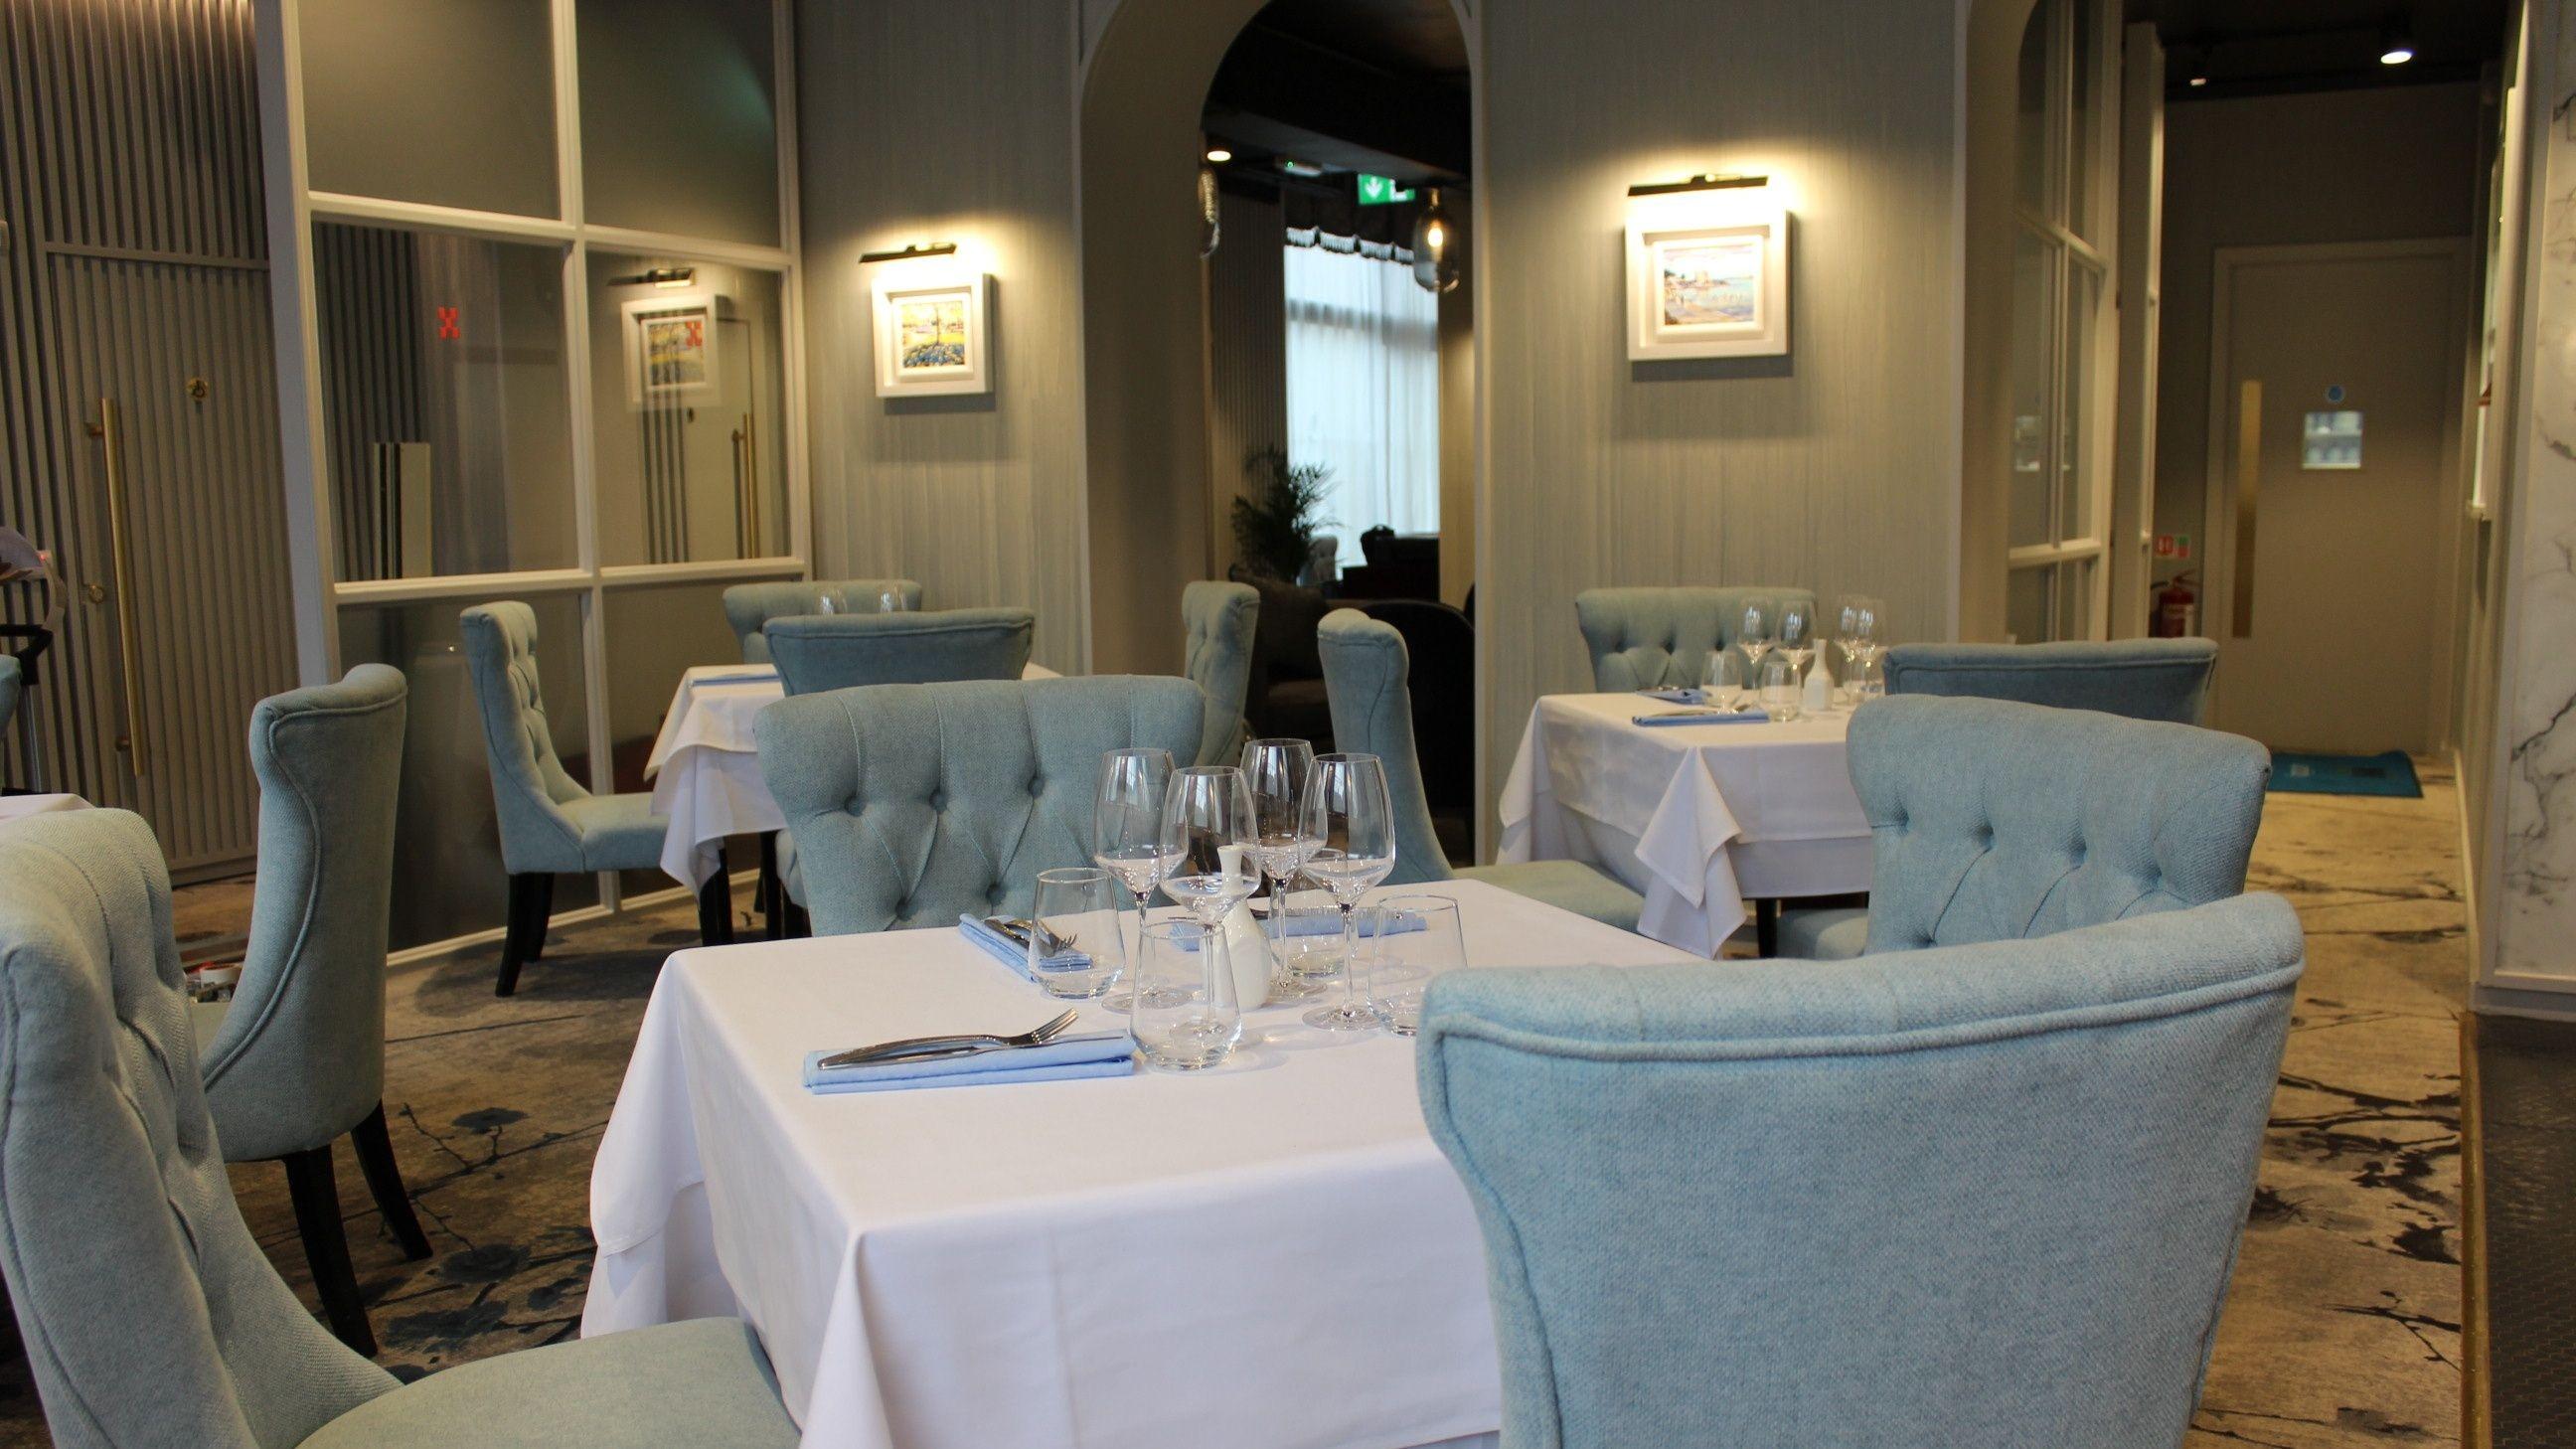 THE BEST 10 Modern European Restaurants near Grange - Yelp